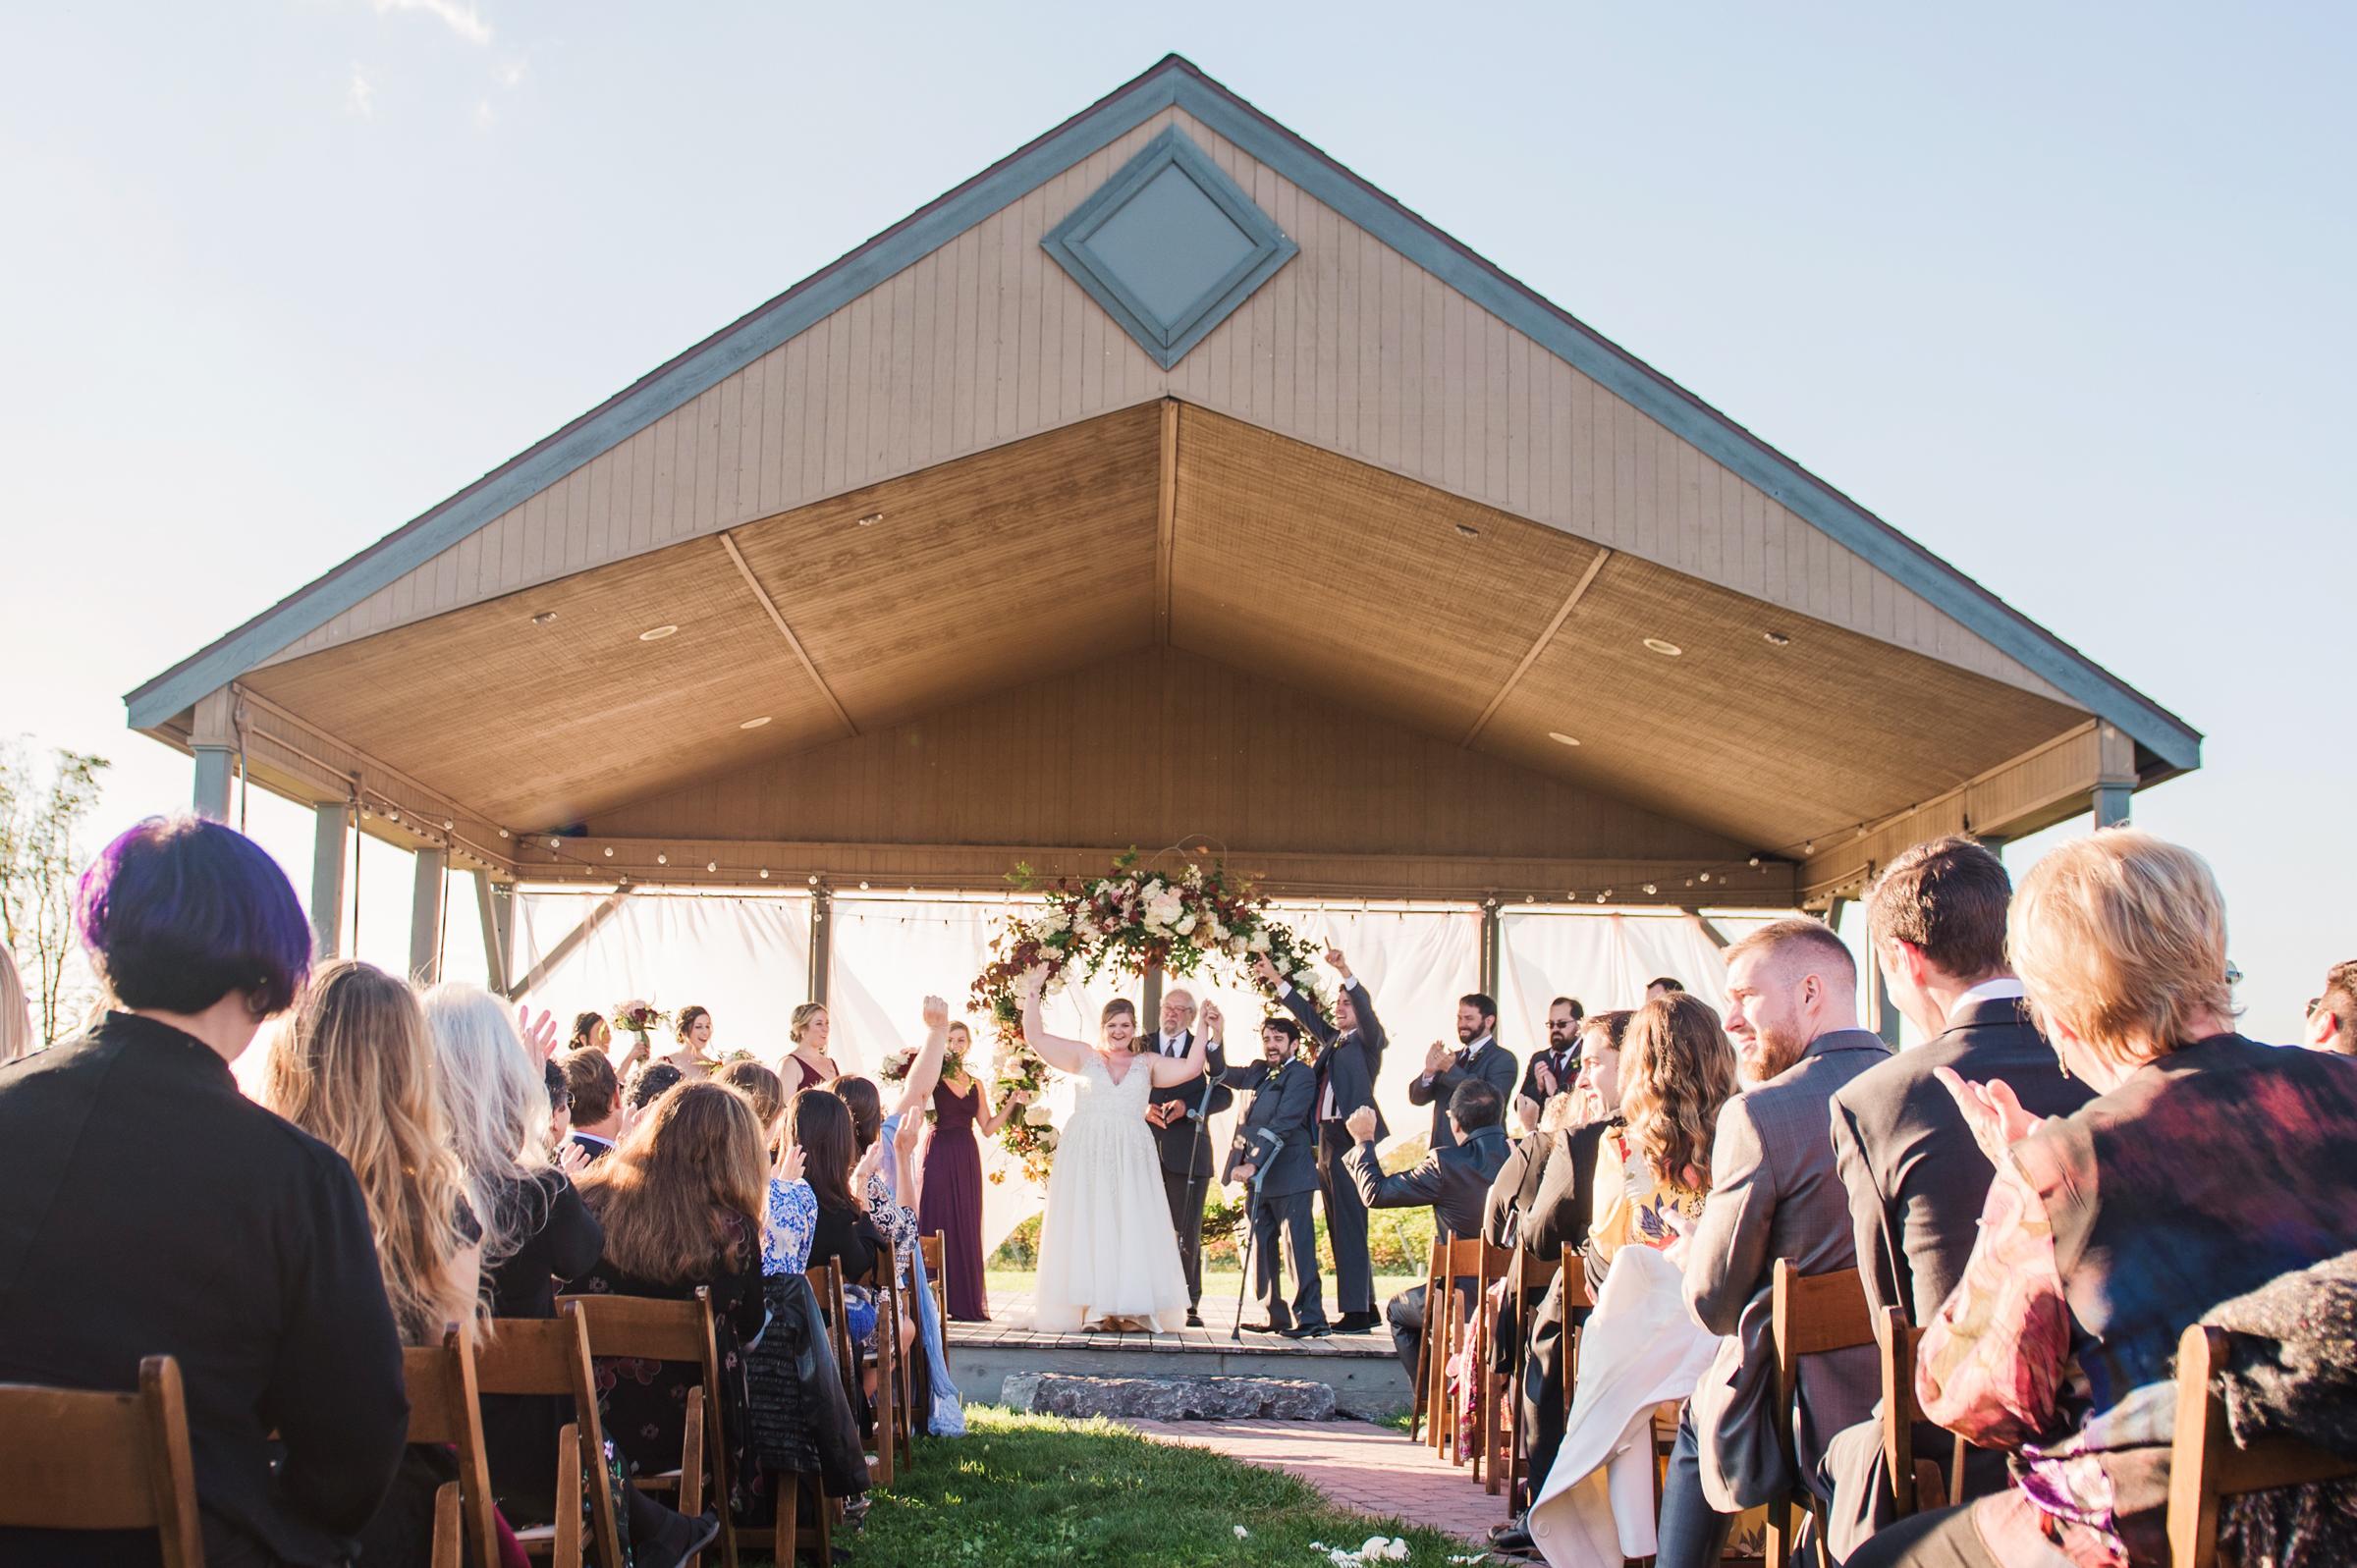 Zugibe_Vineyards_Finger_Lakes_Wedding_JILL_STUDIO_Rochester_NY_Photographer_DSC_4021.jpg